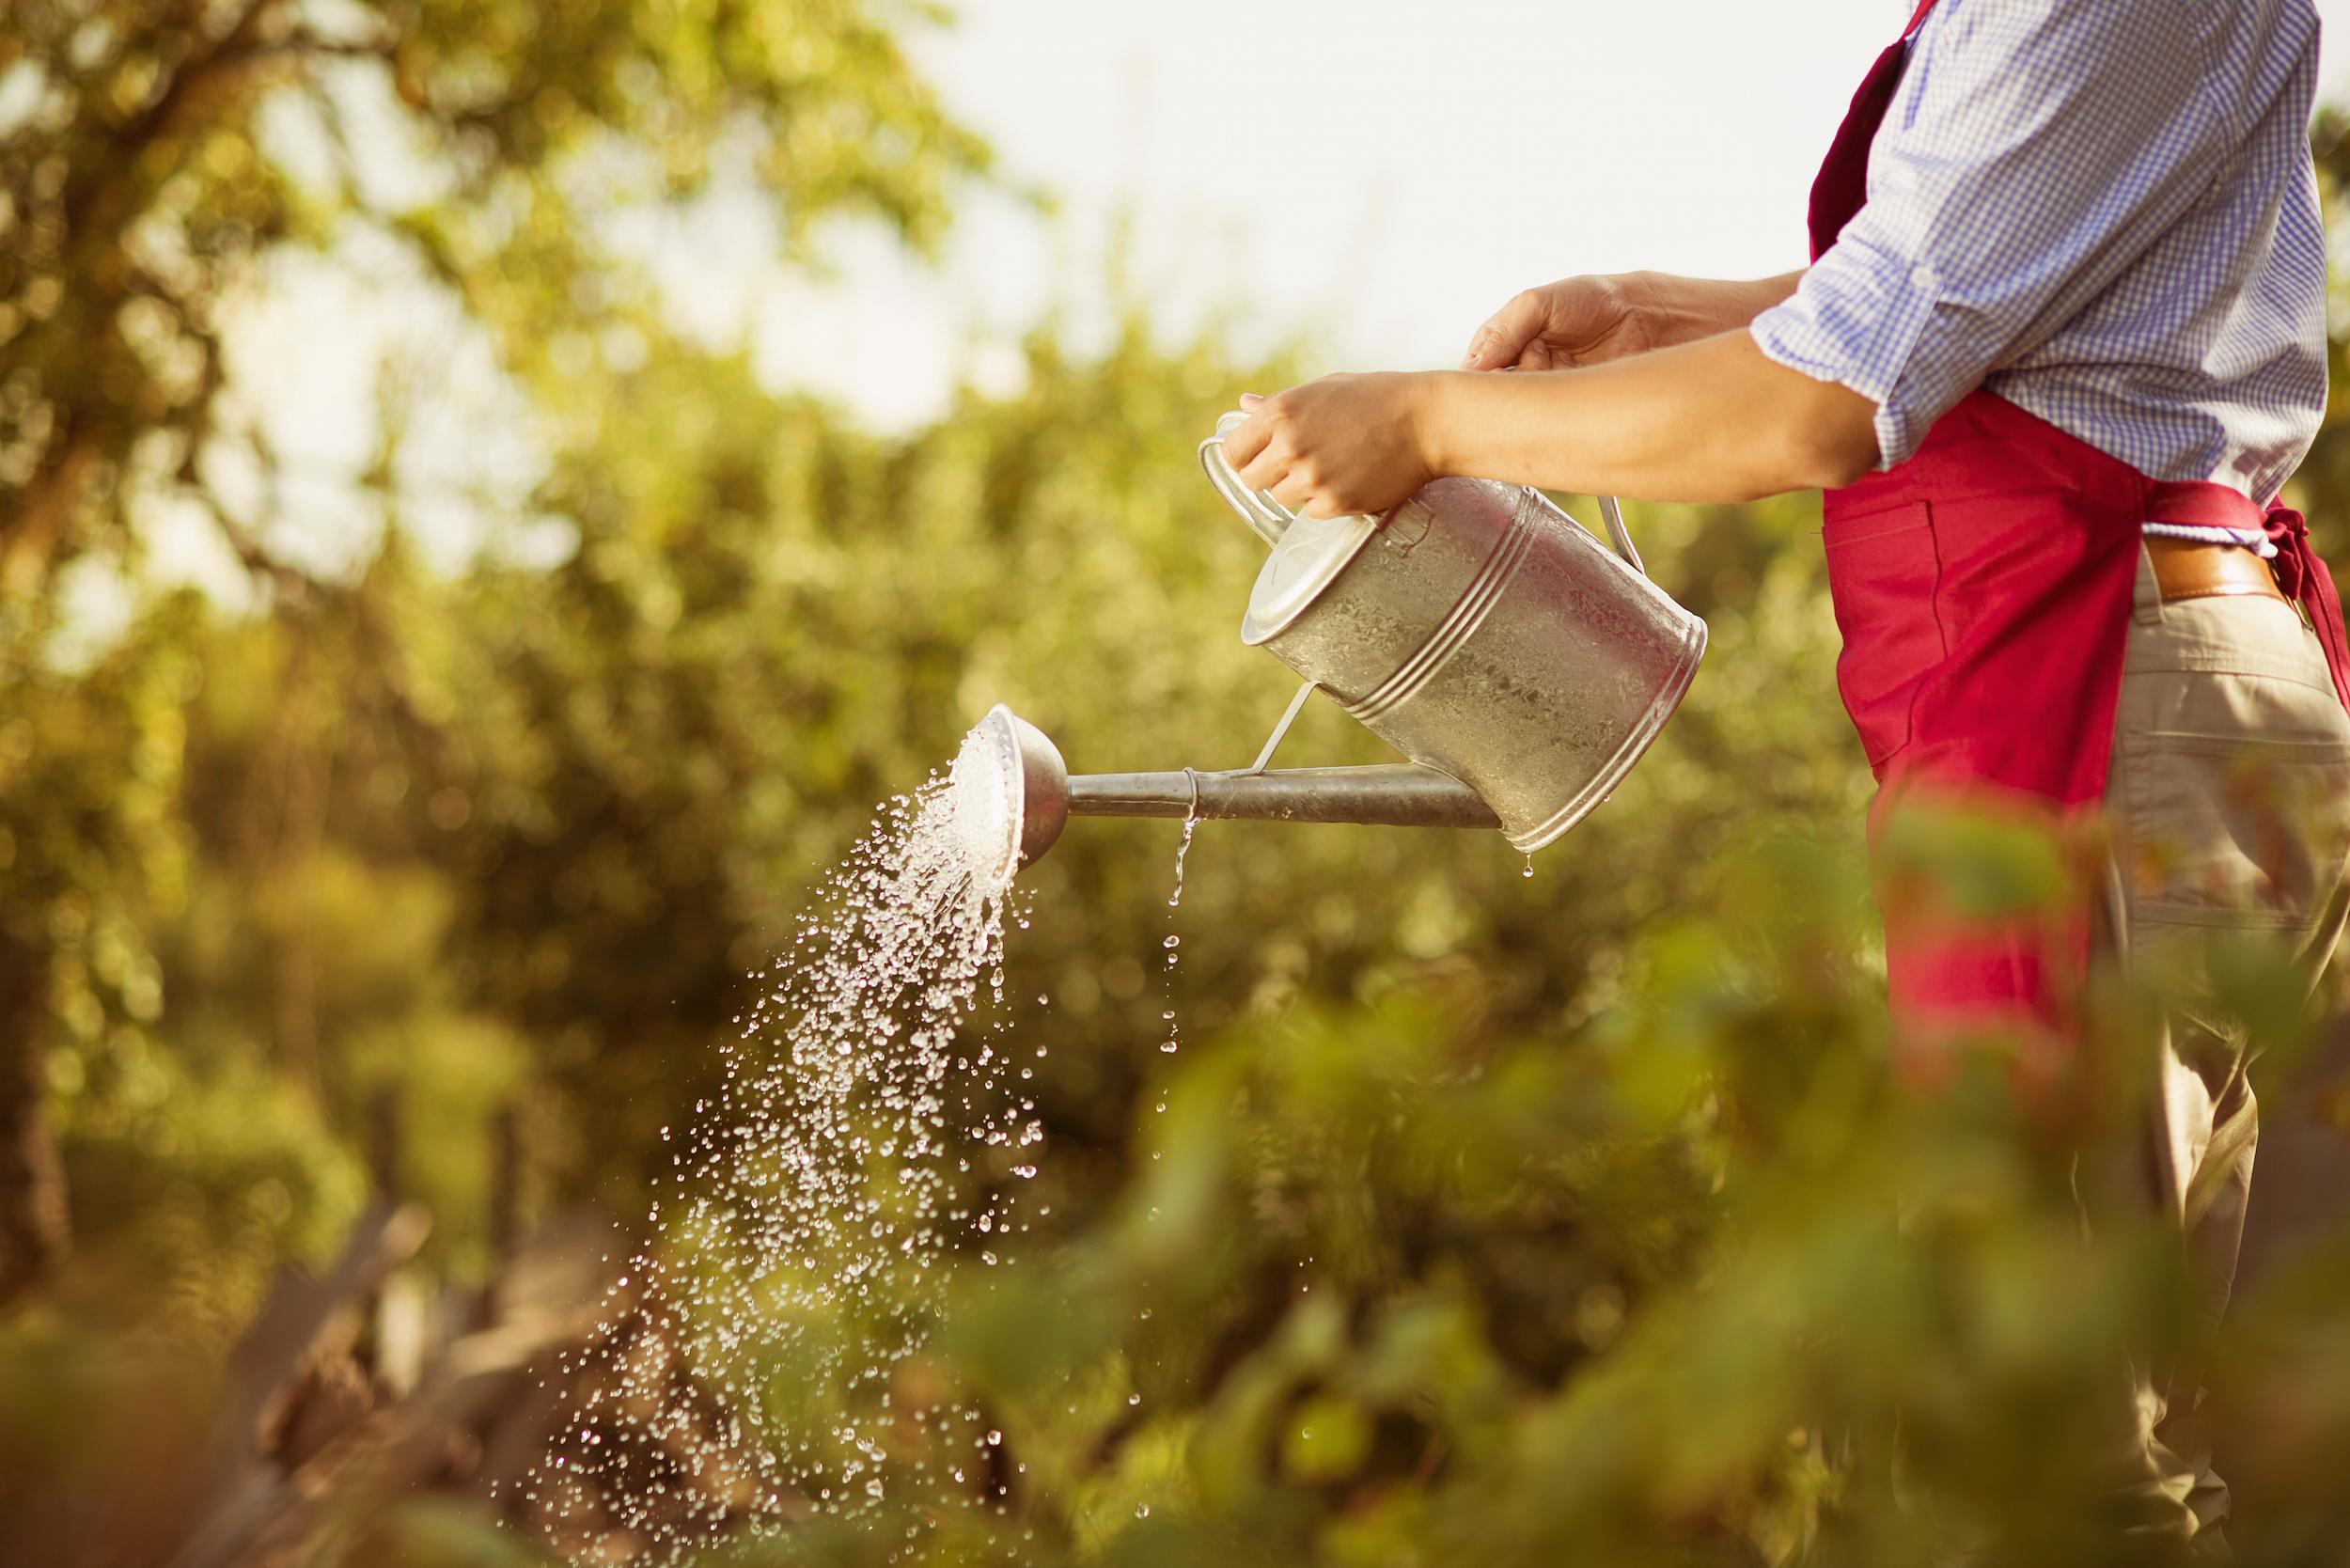 The Humble Vegetable Garden: A Fun, Health-conscious Home Project ...